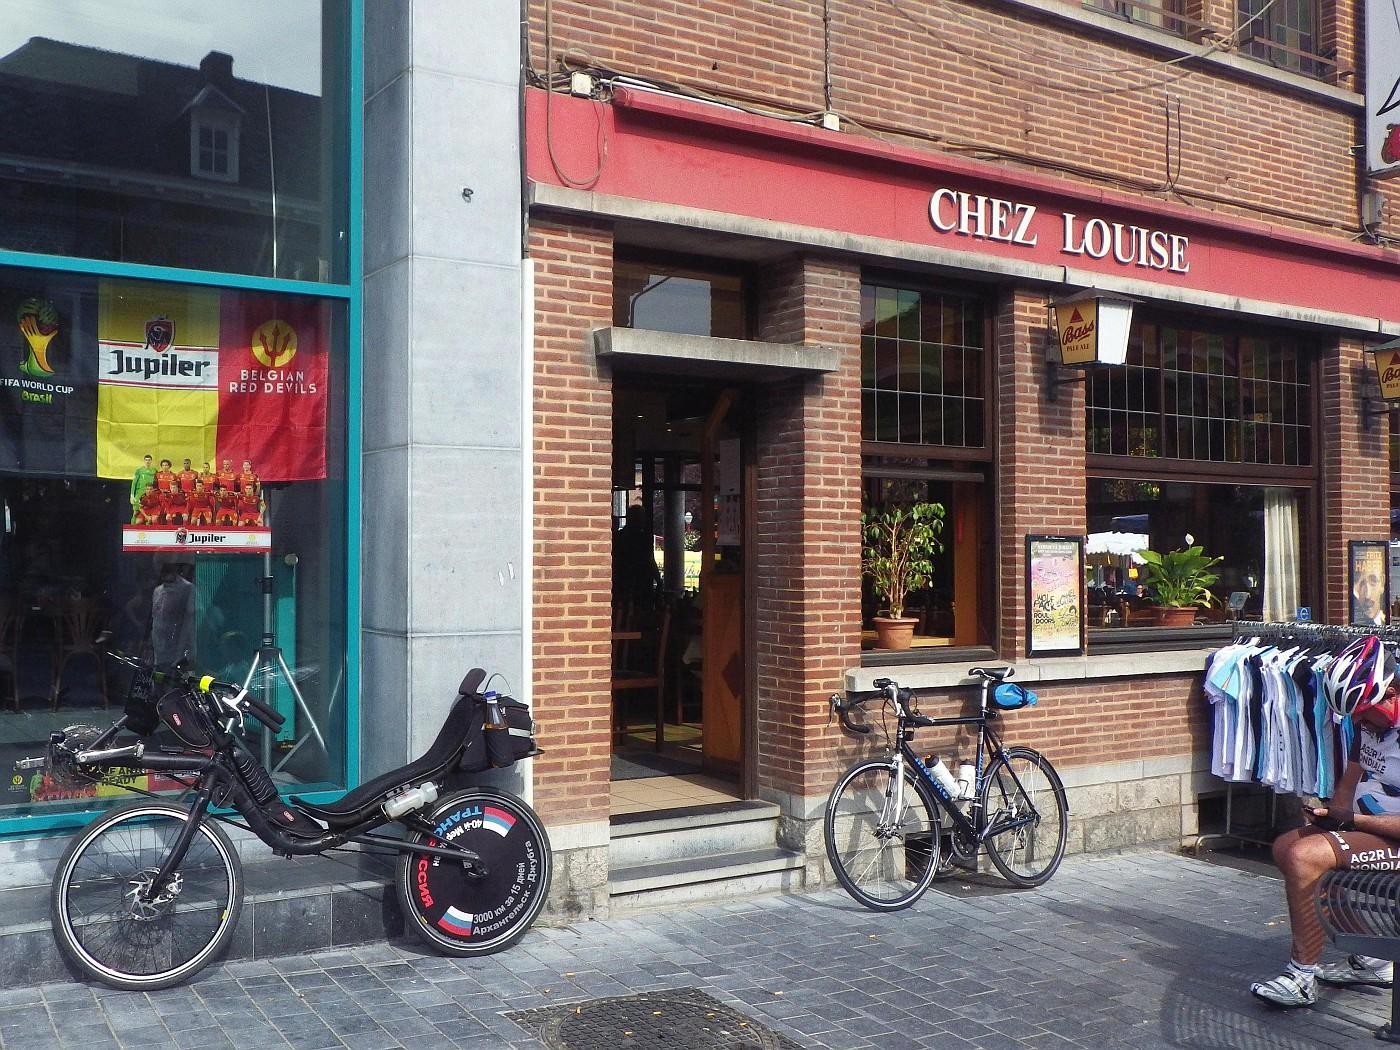 Kontrolle Chez Louise, Frameries